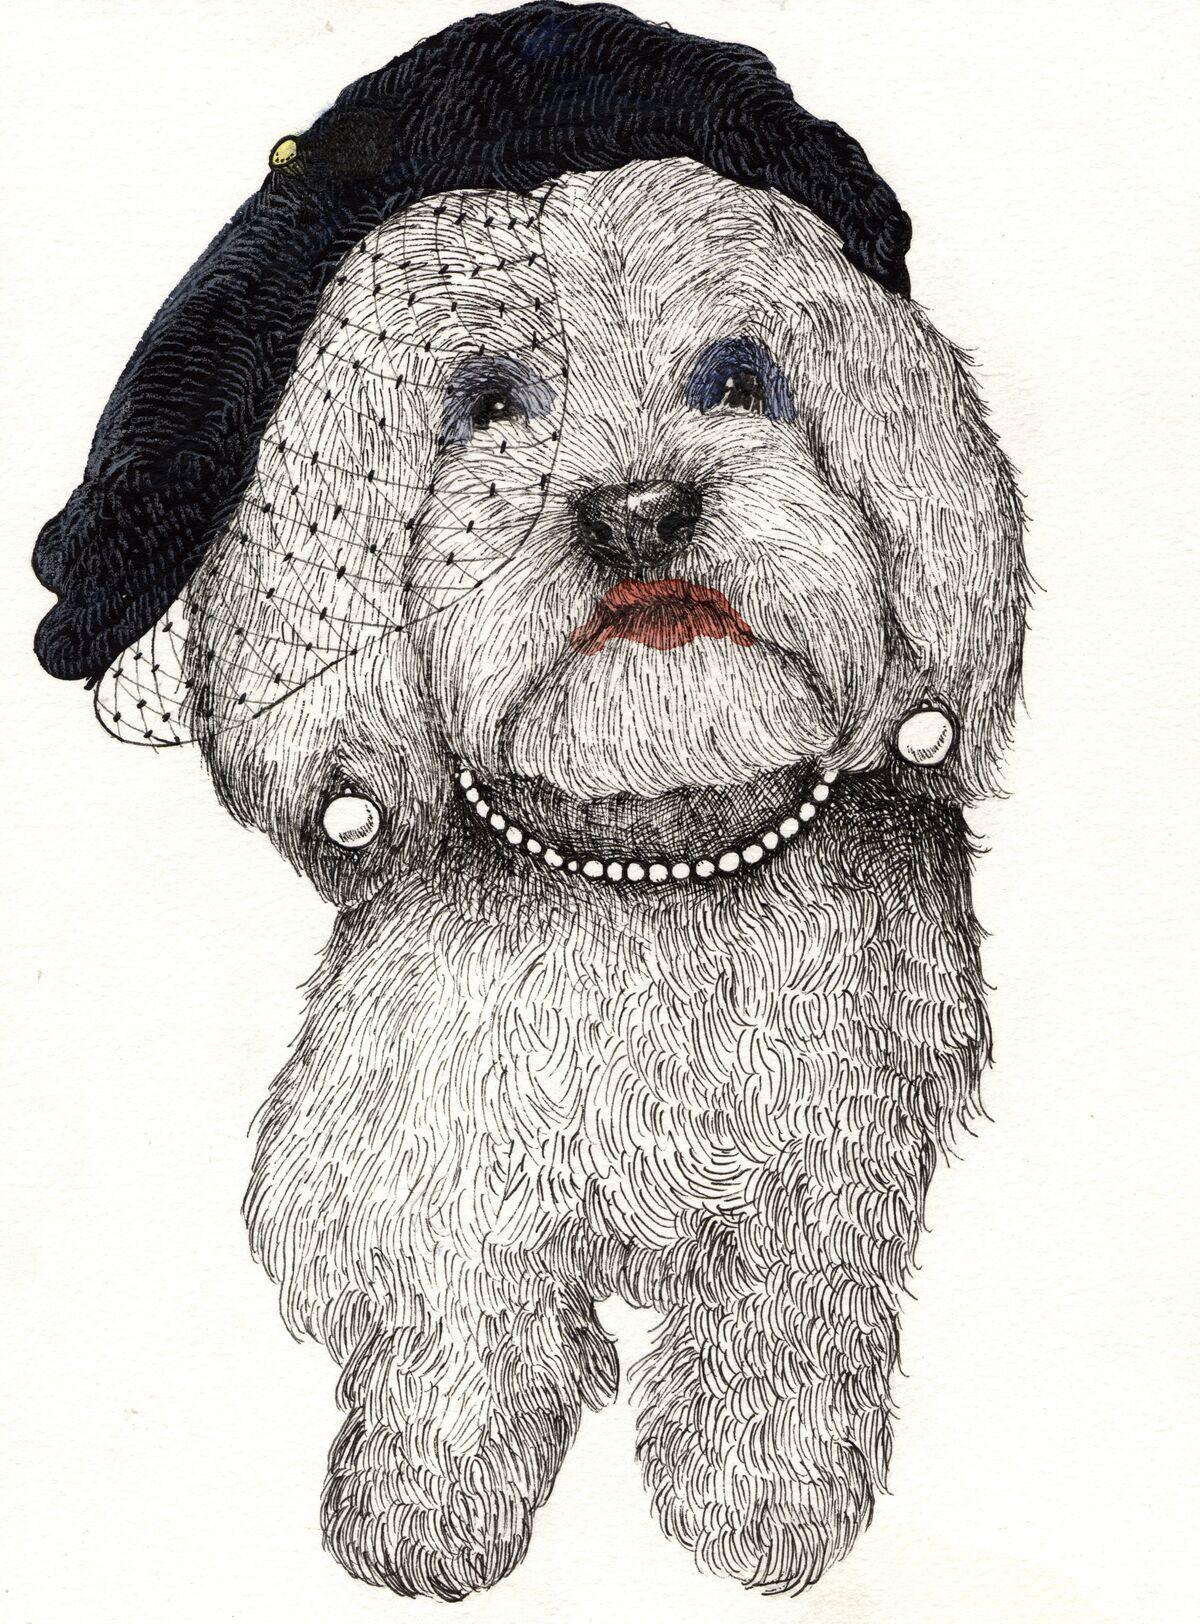 J. Penry, Lola, 2008. Courtesy of the artist.